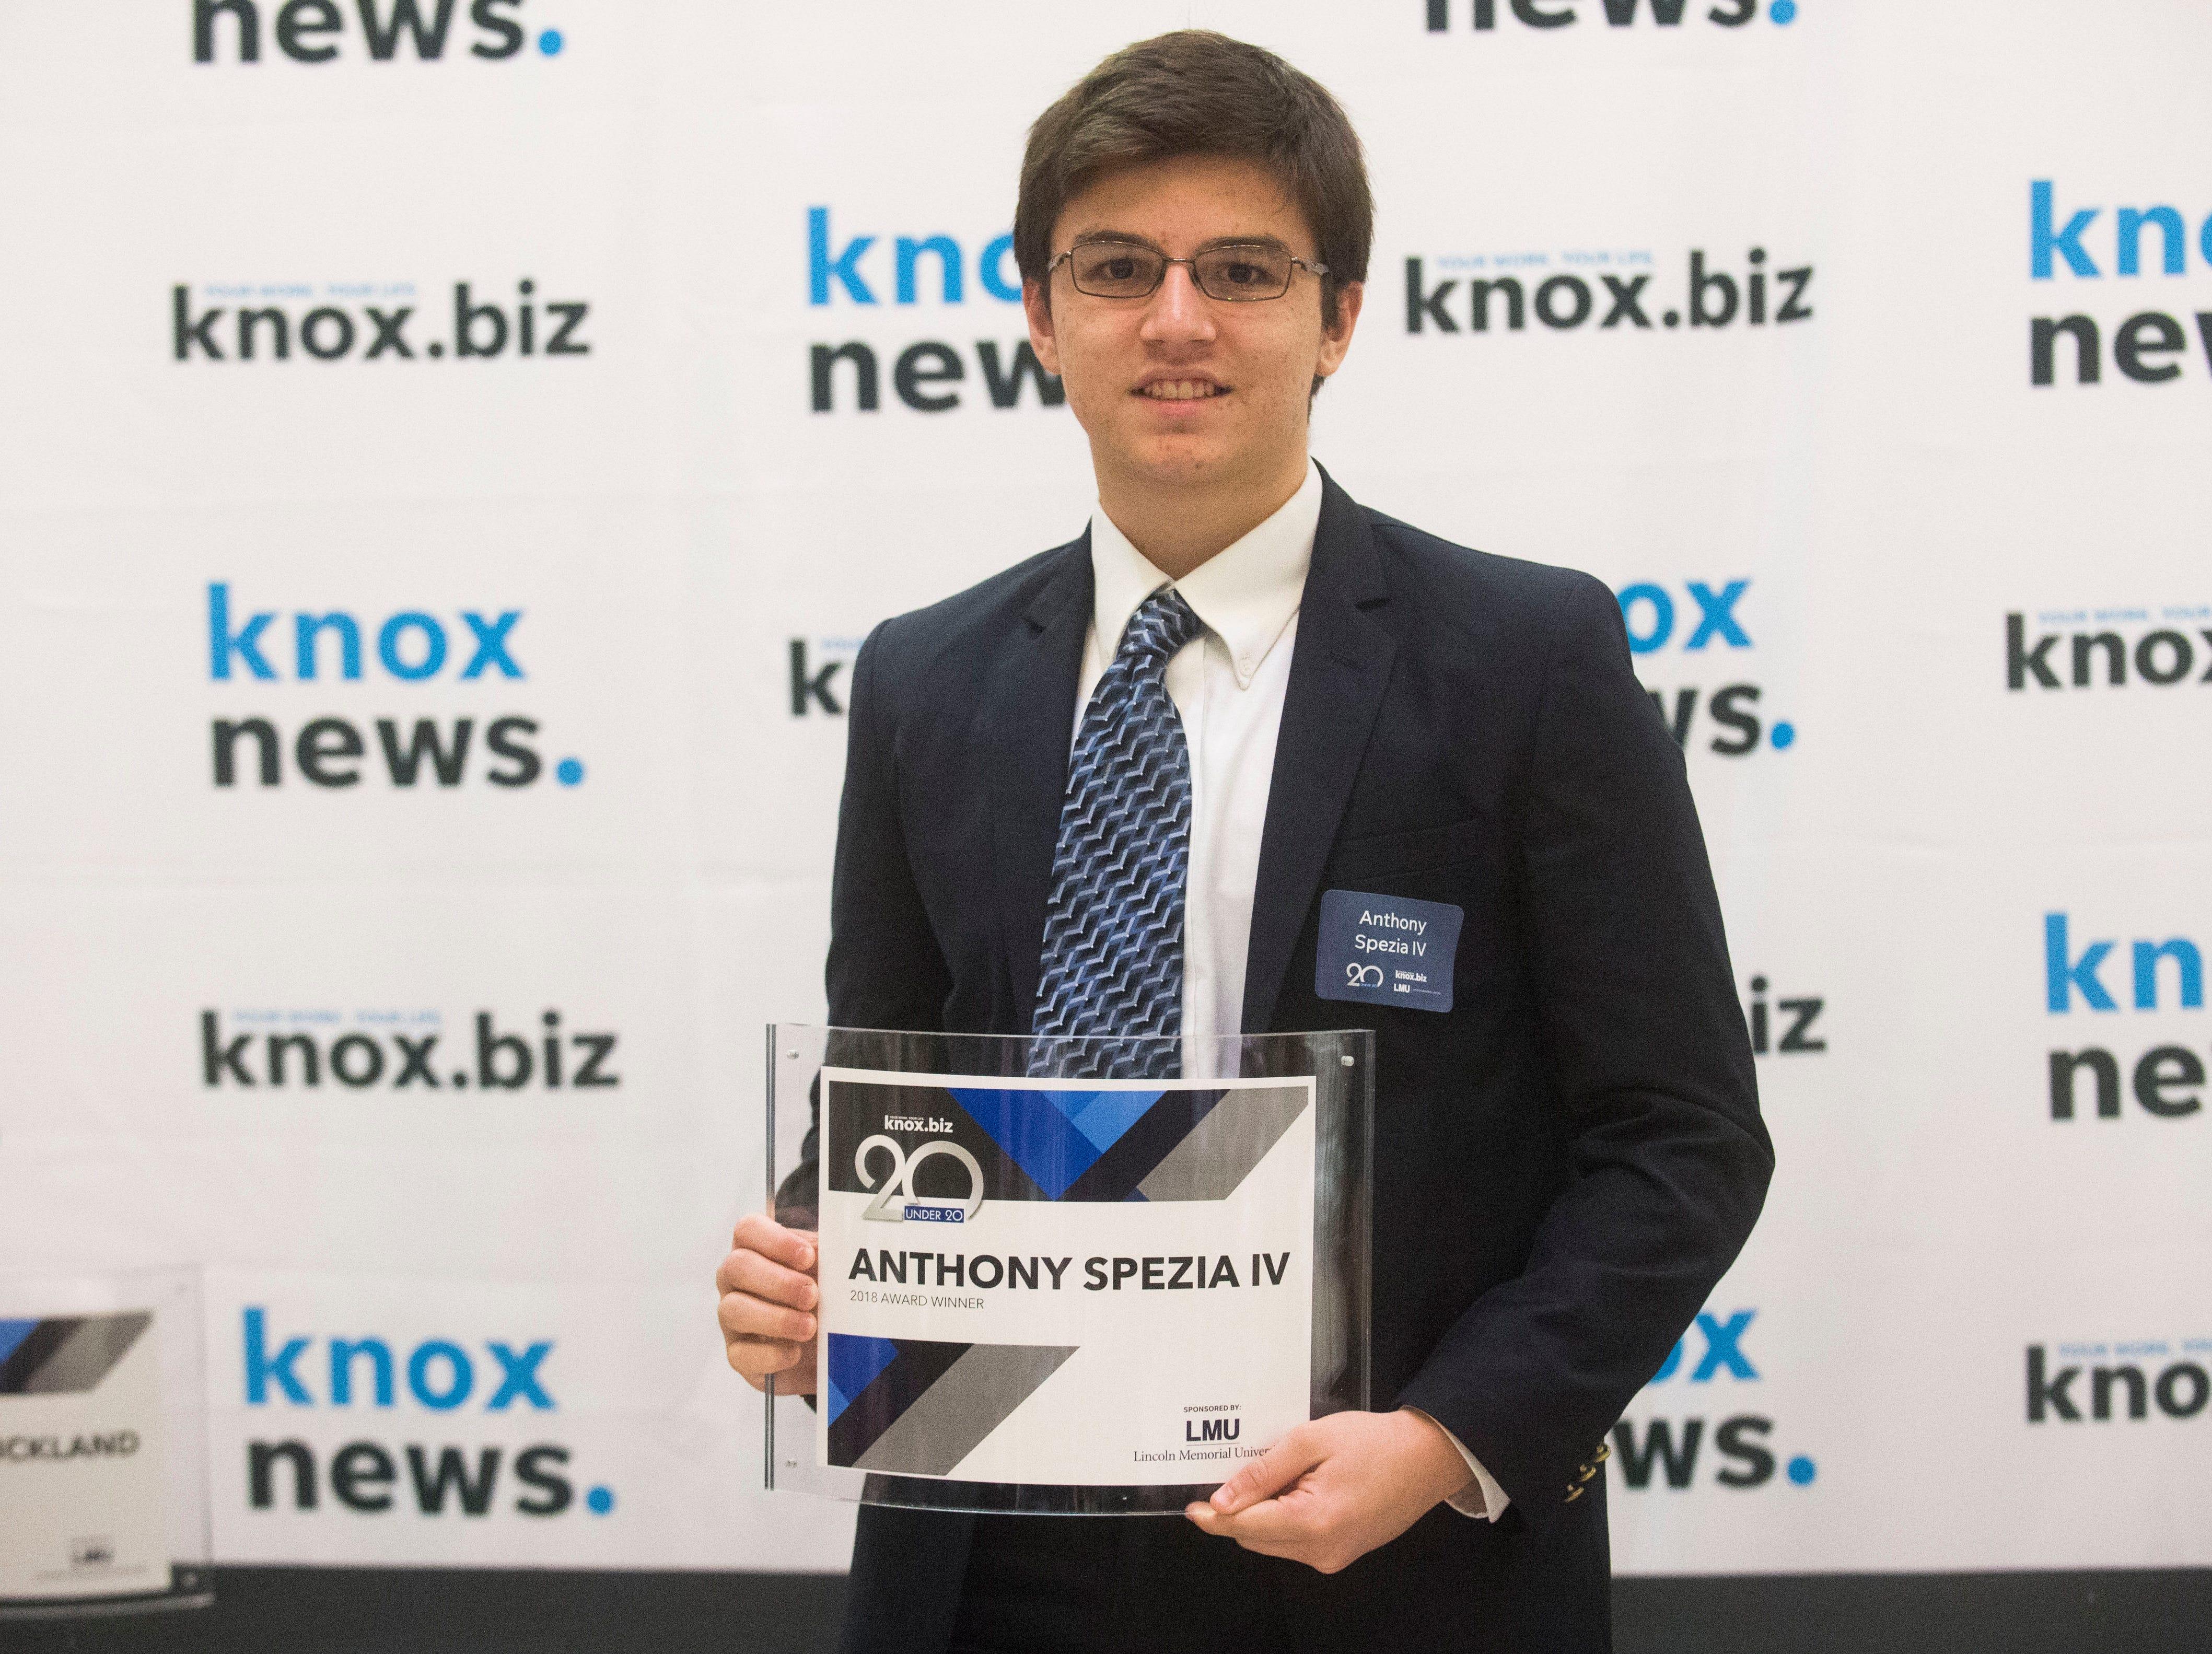 Anthony Spezia IV, 20 under 20 award recipient.